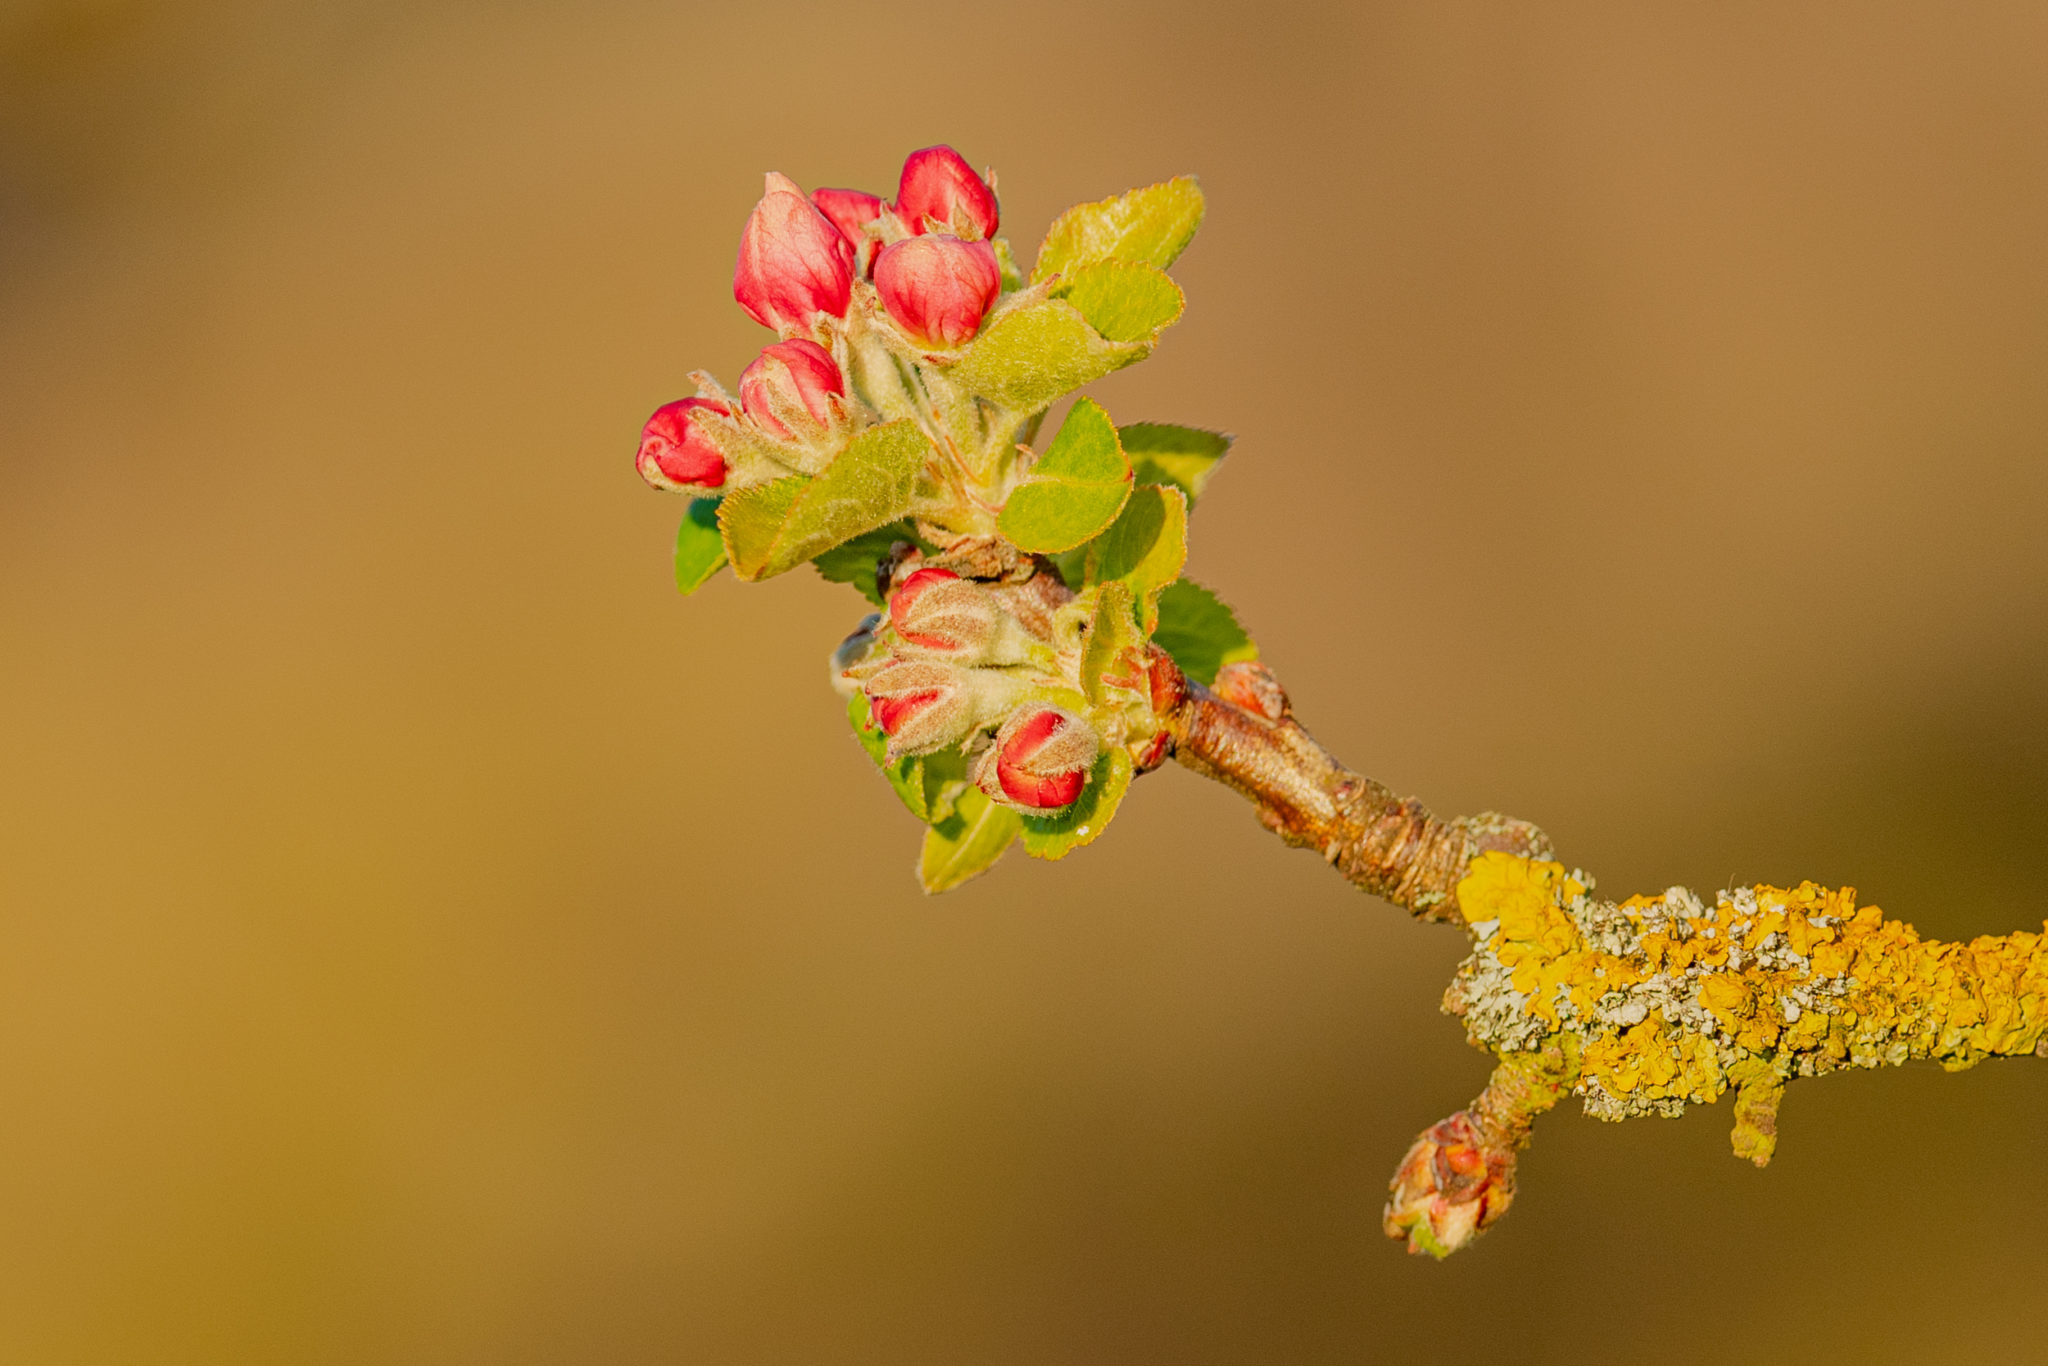 Naturfotografie Olaf & Sylvia Rentzsch, Apfel, Apfelblüte